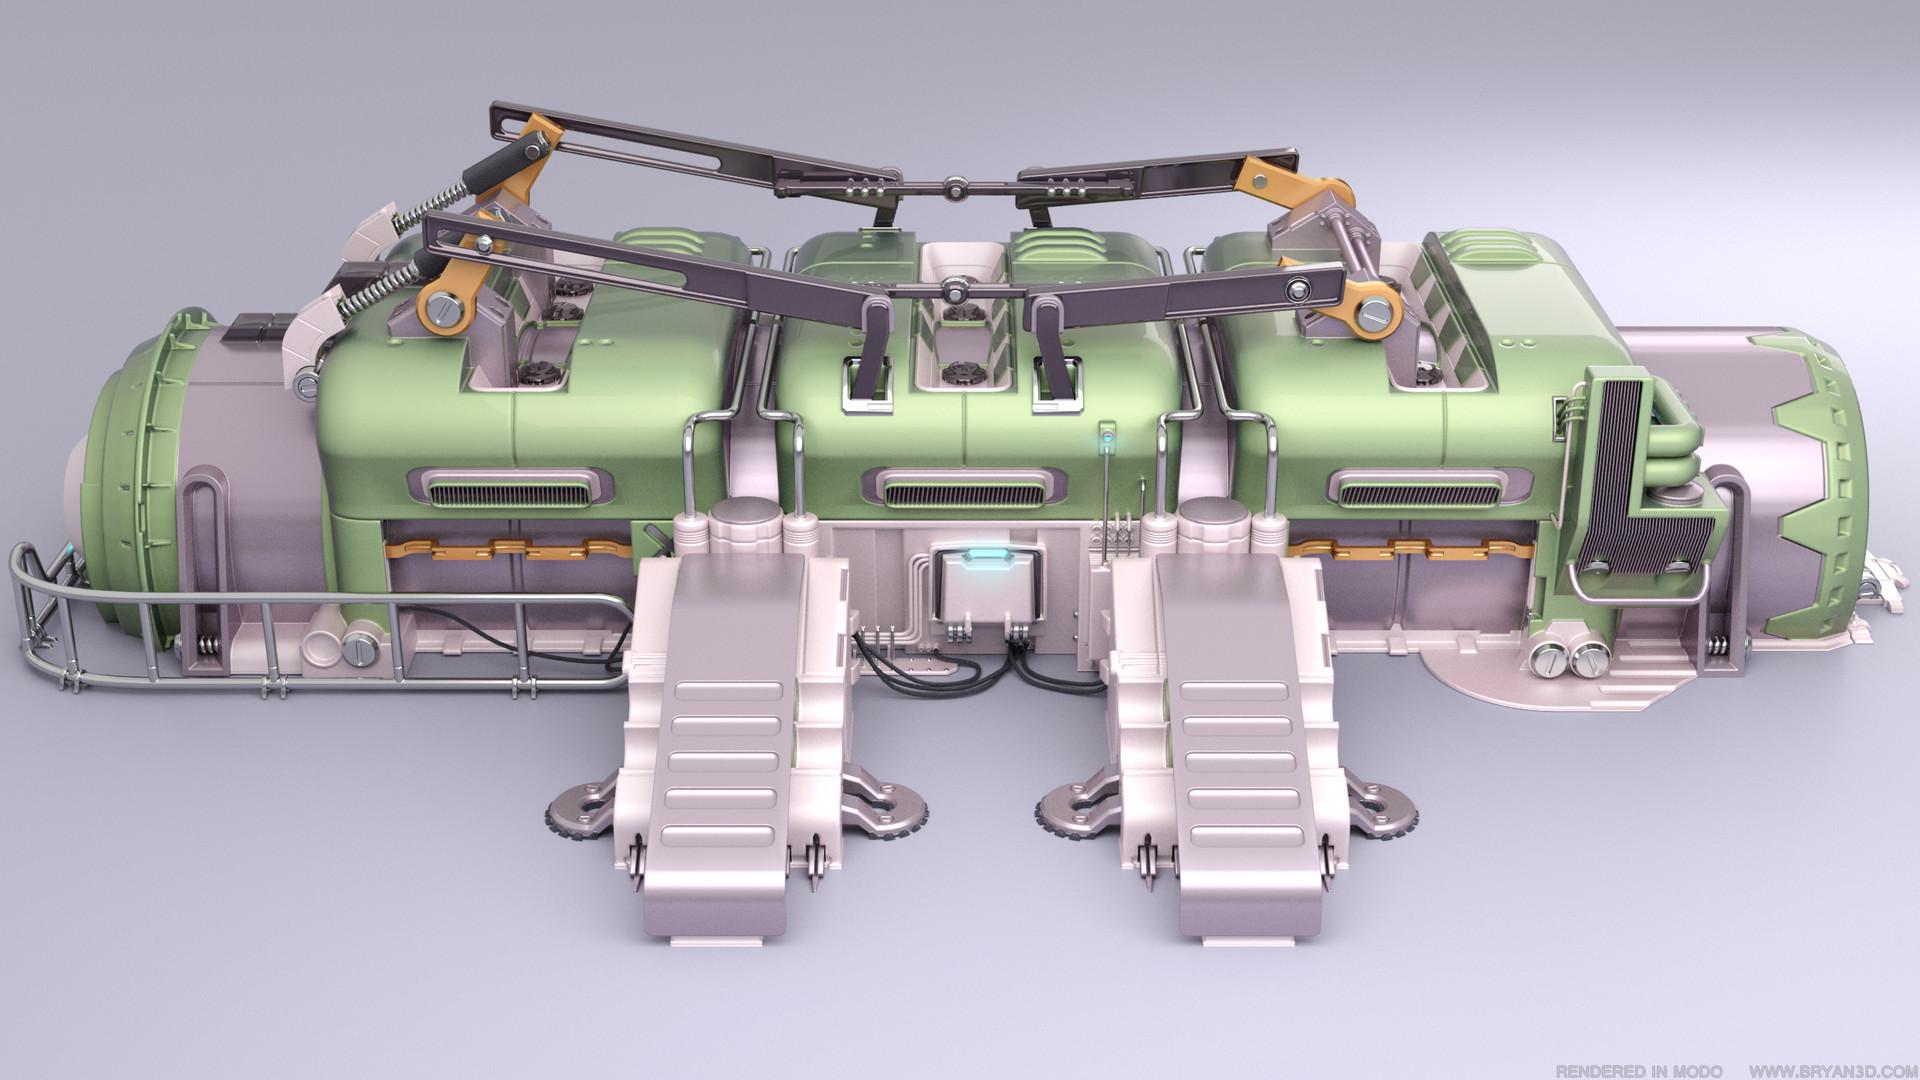 Bryan shannon 0 generator final 03